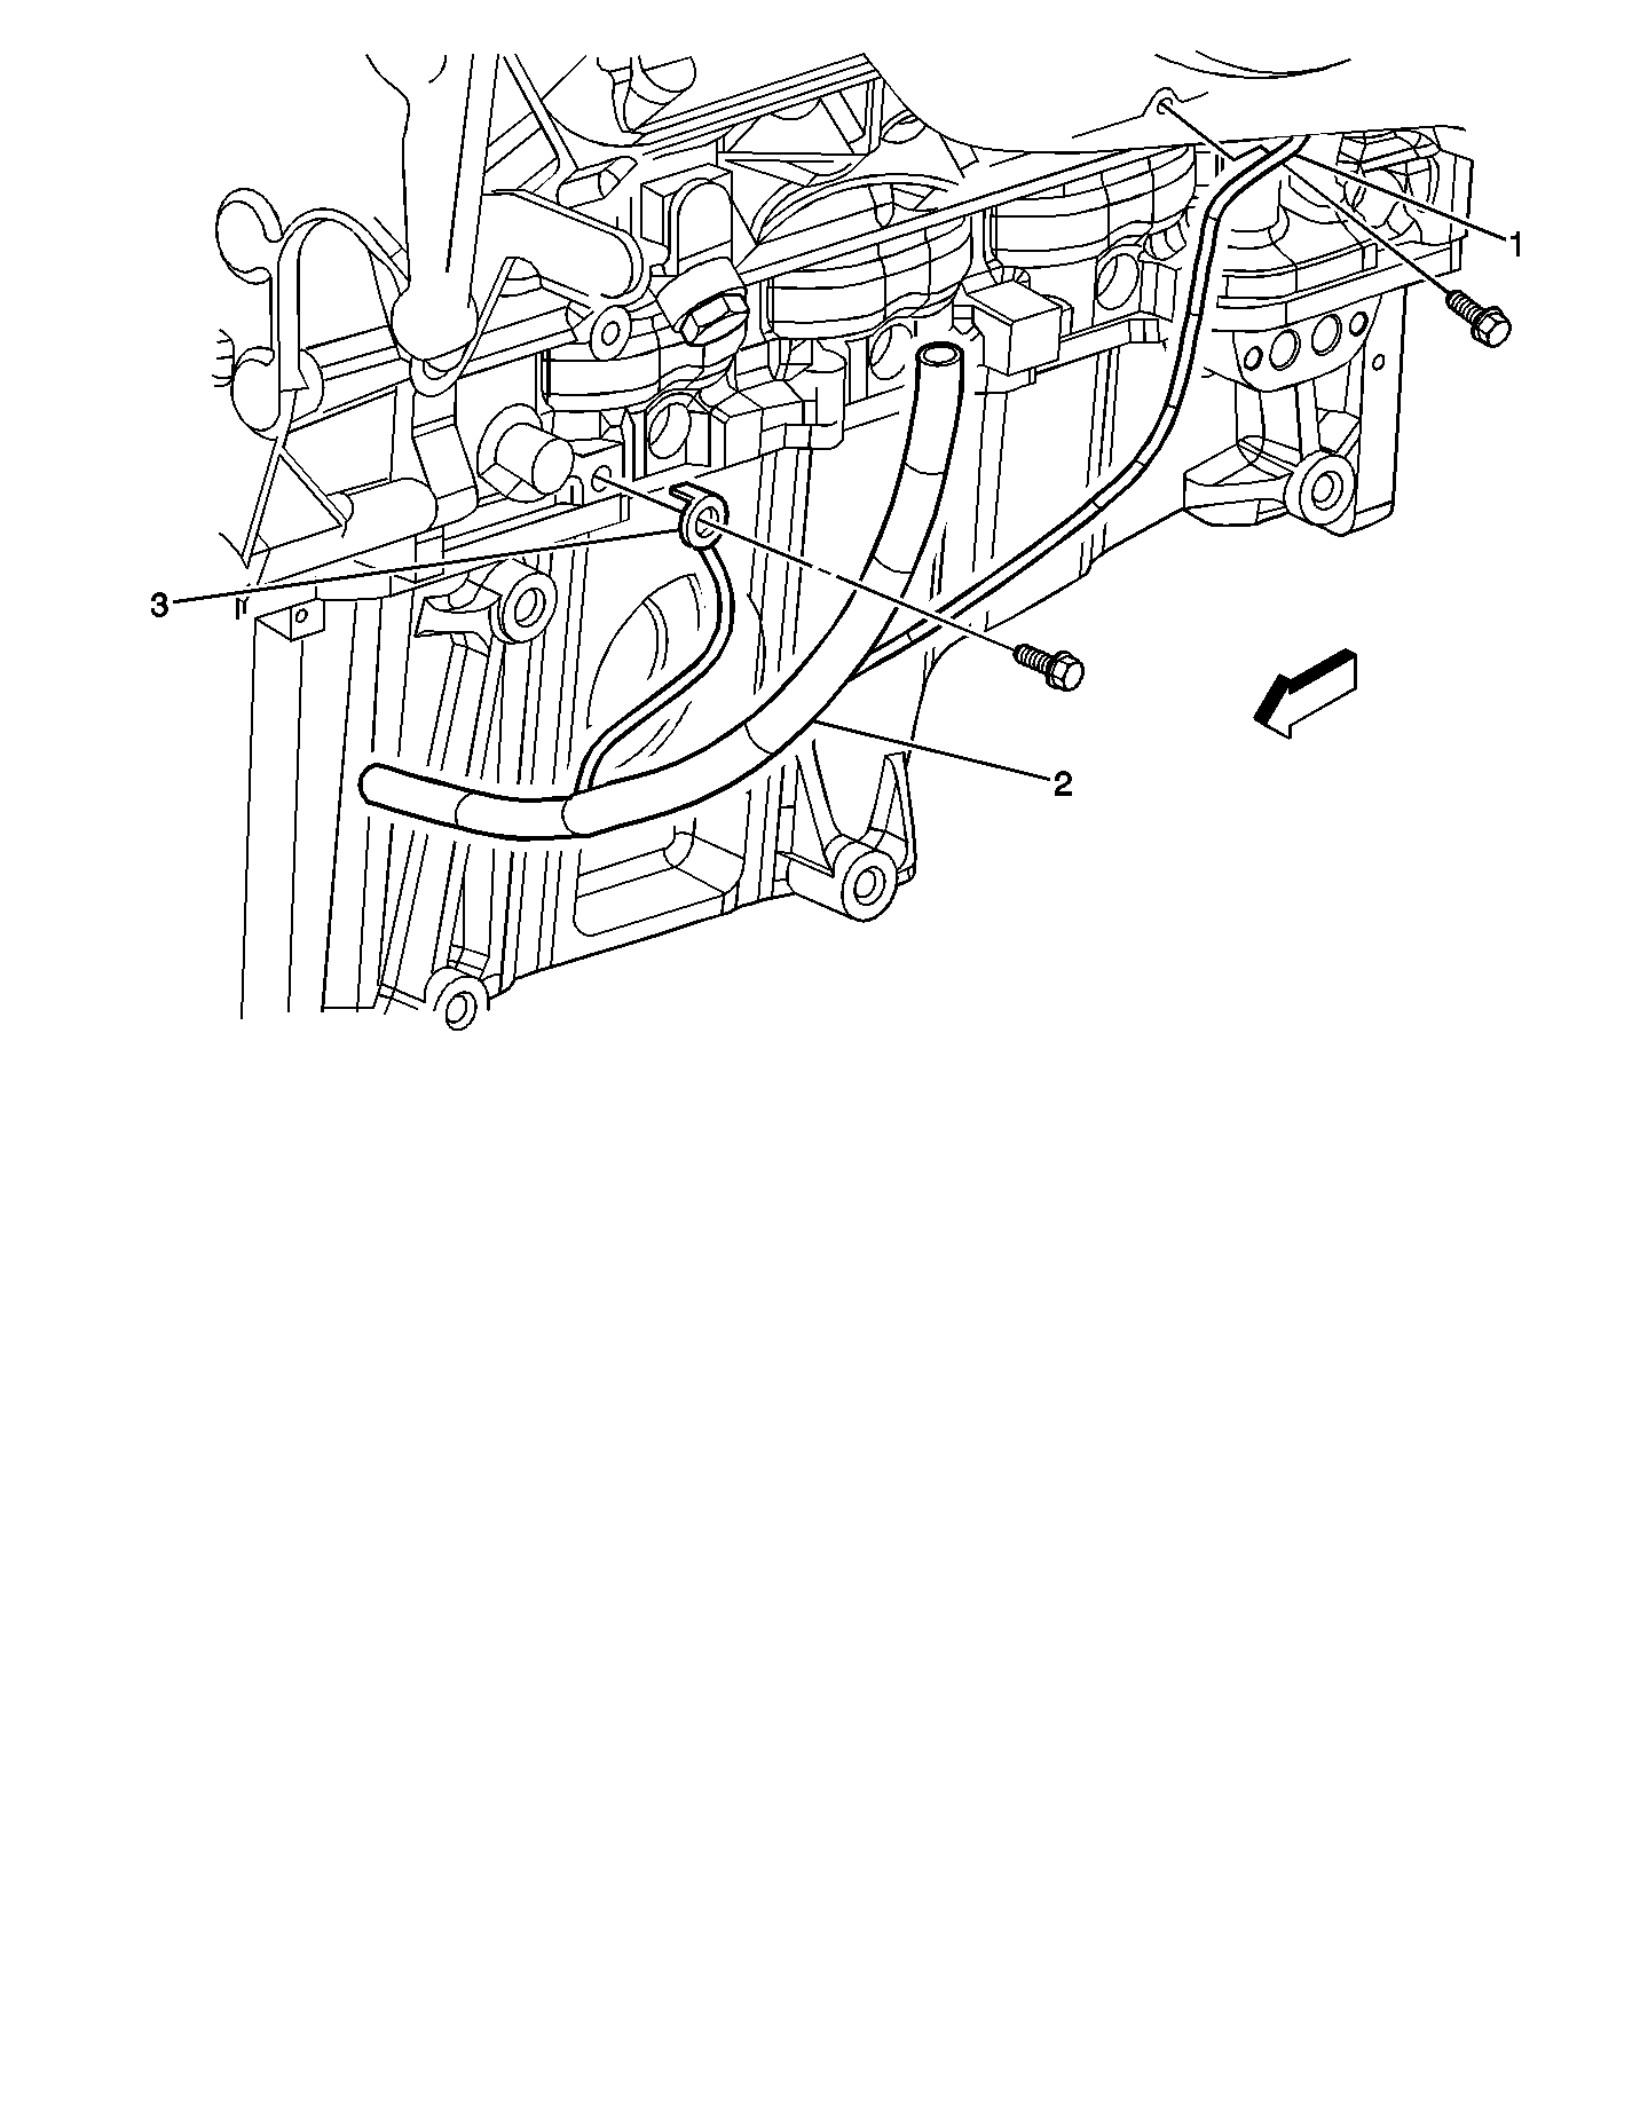 2006 trailblazer fuel pump and pcm relays flickering on. Black Bedroom Furniture Sets. Home Design Ideas